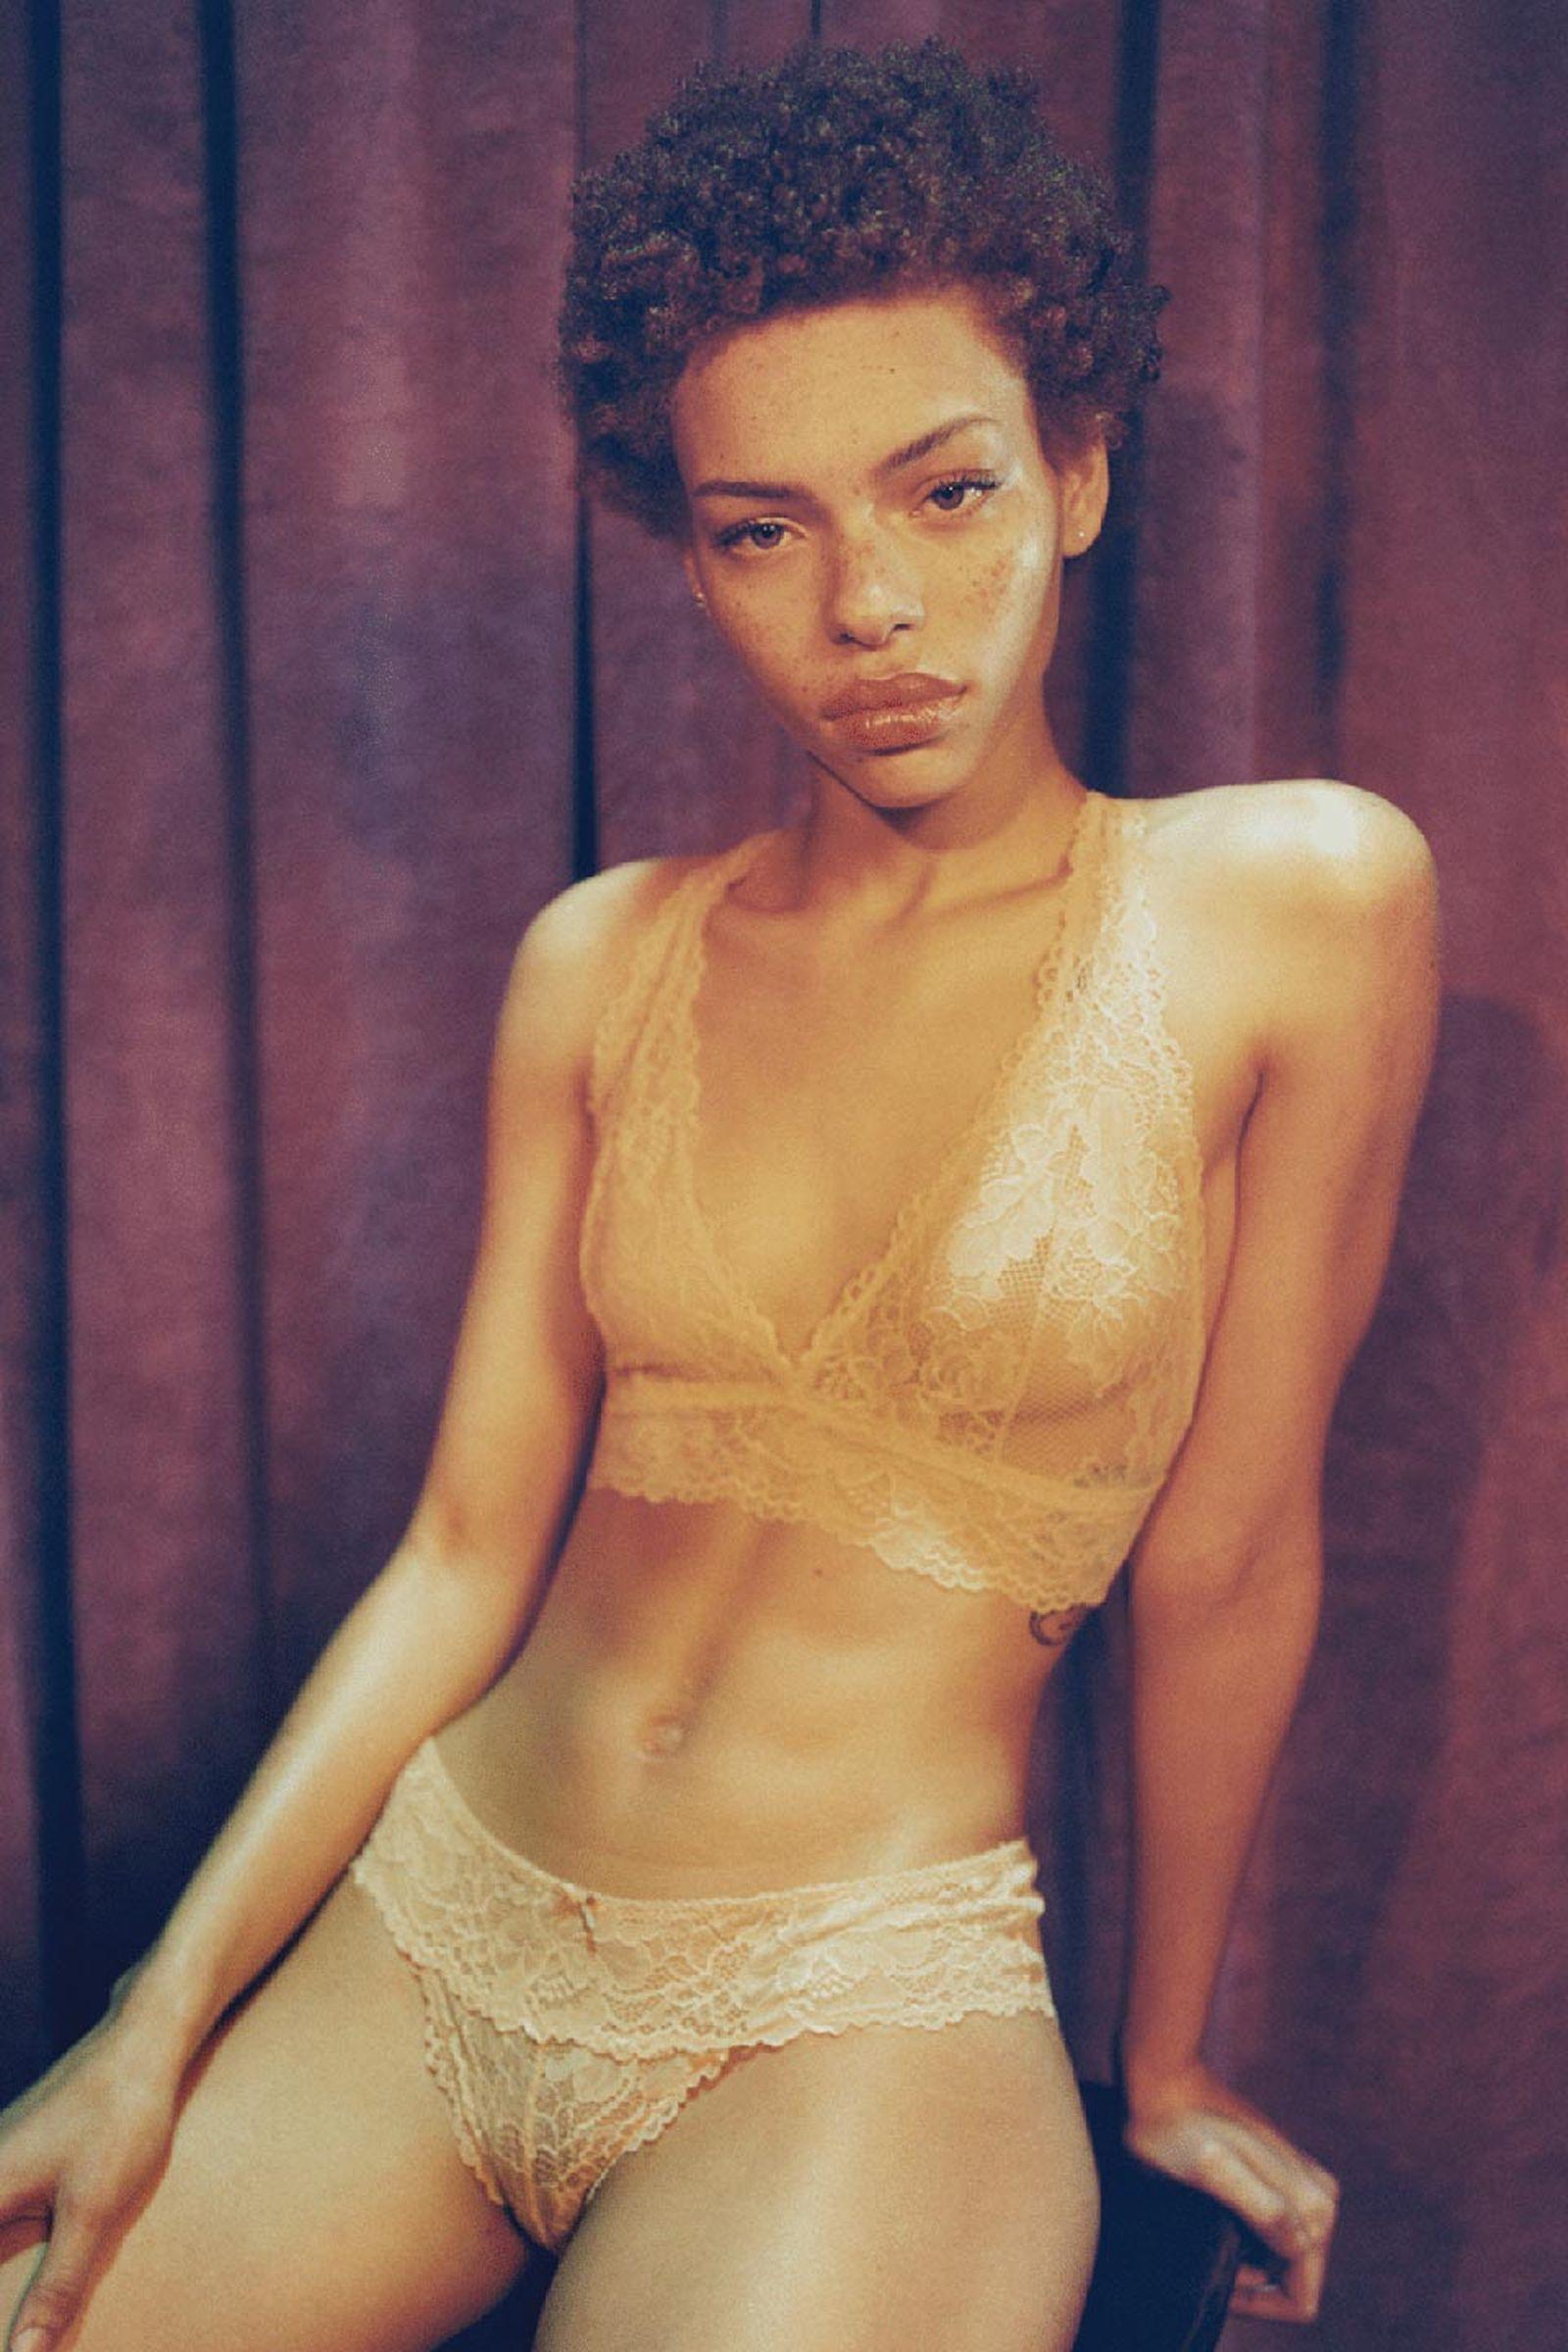 rihanna-savage-fenty-lingerie-first-look-14